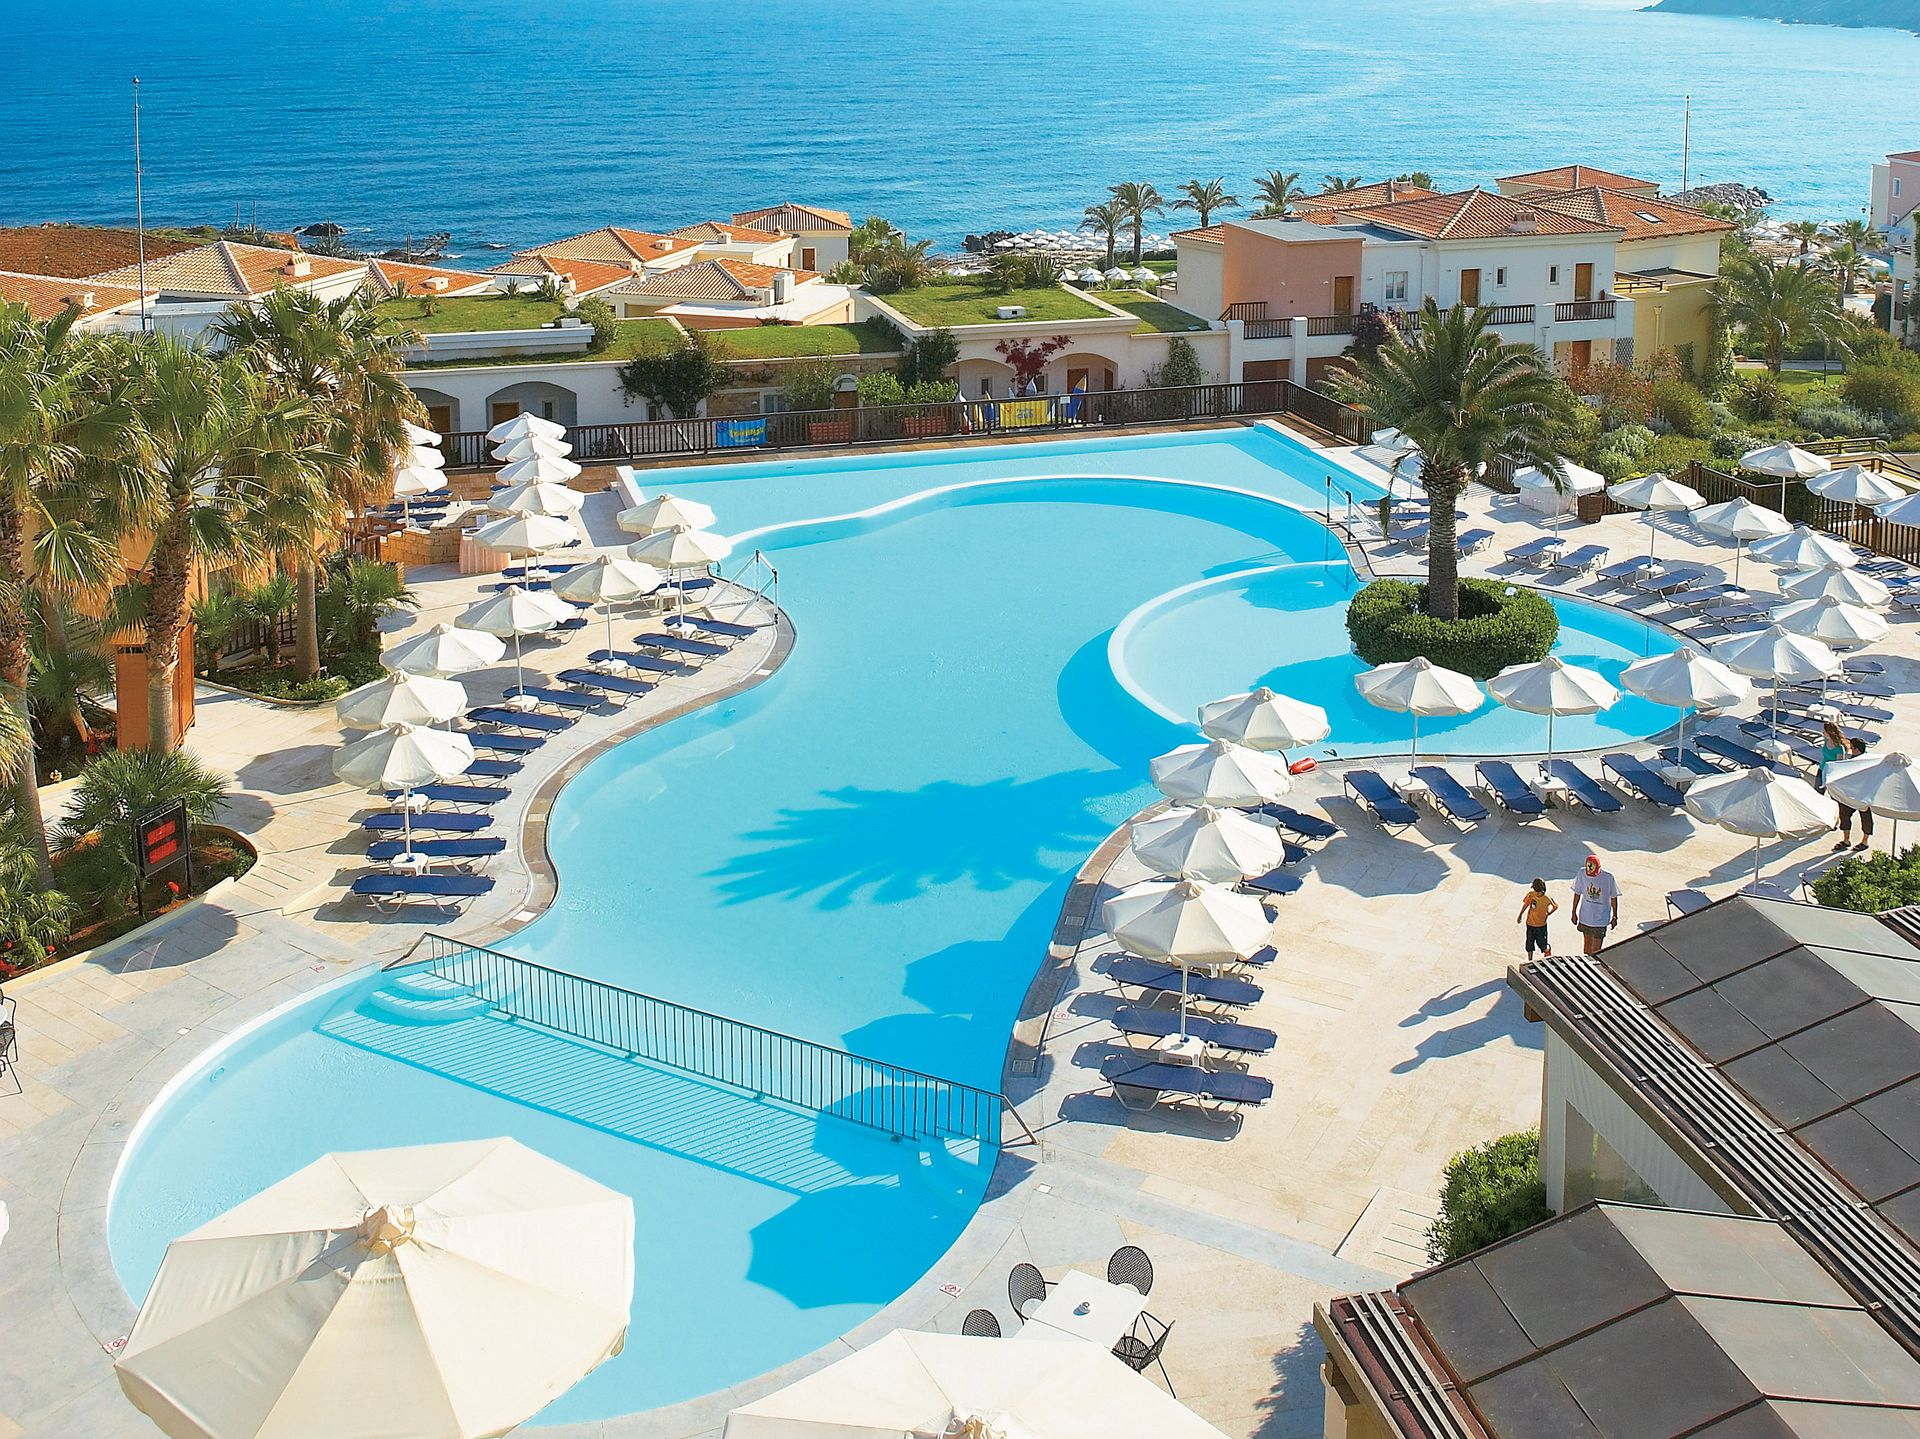 4* Grecotel Club Marine Palace & Marine Palace Suites | Πάνορμος, Ρέθυμνο